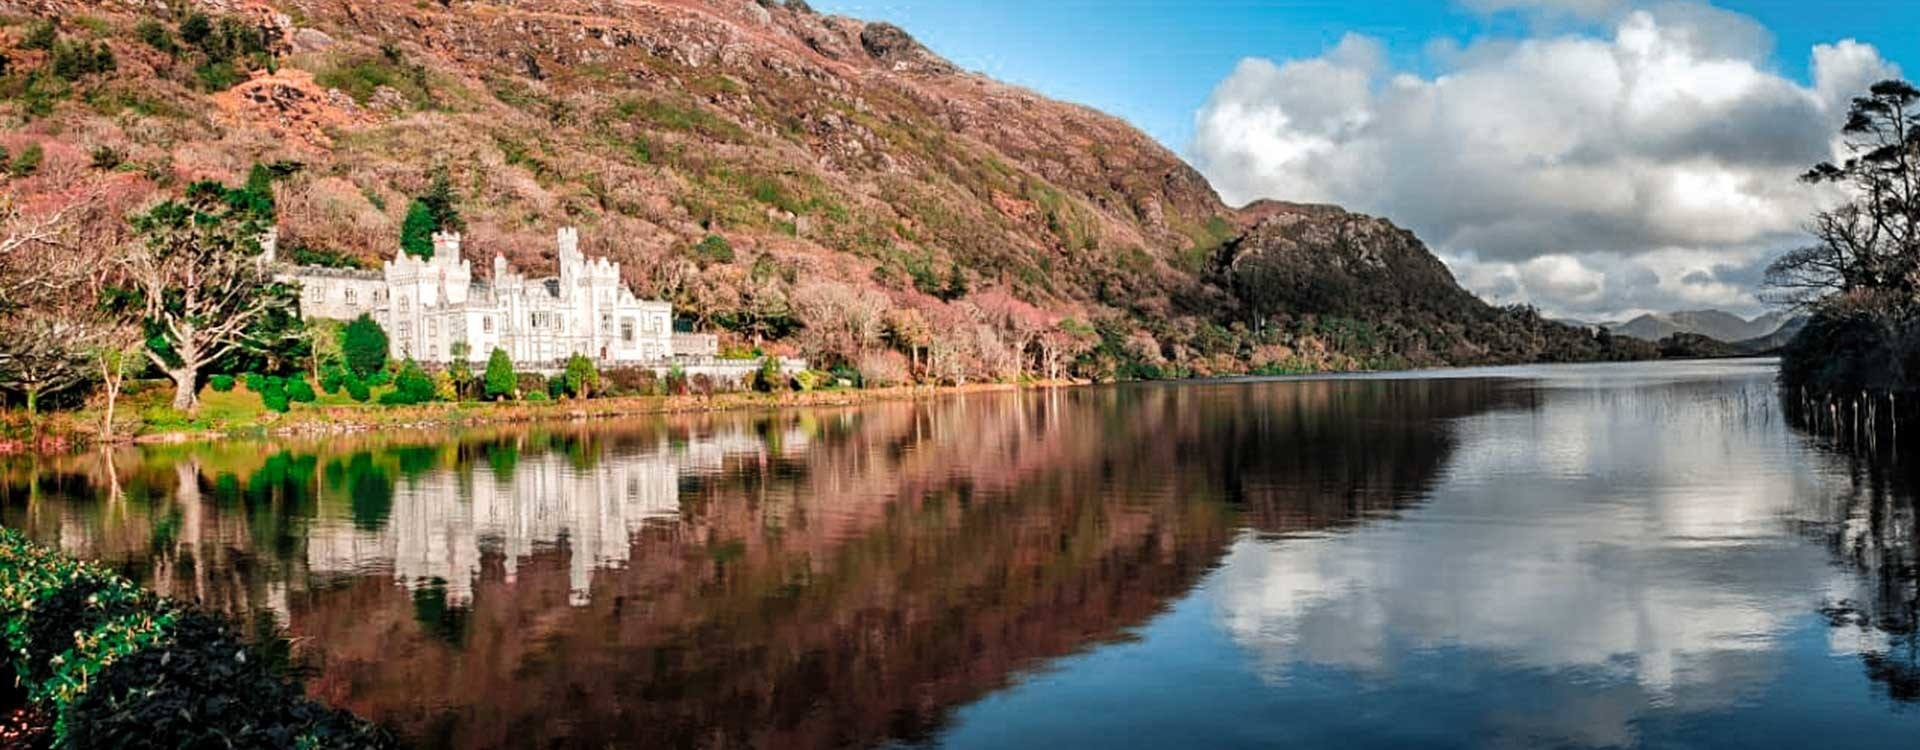 2 Day Western Ireland